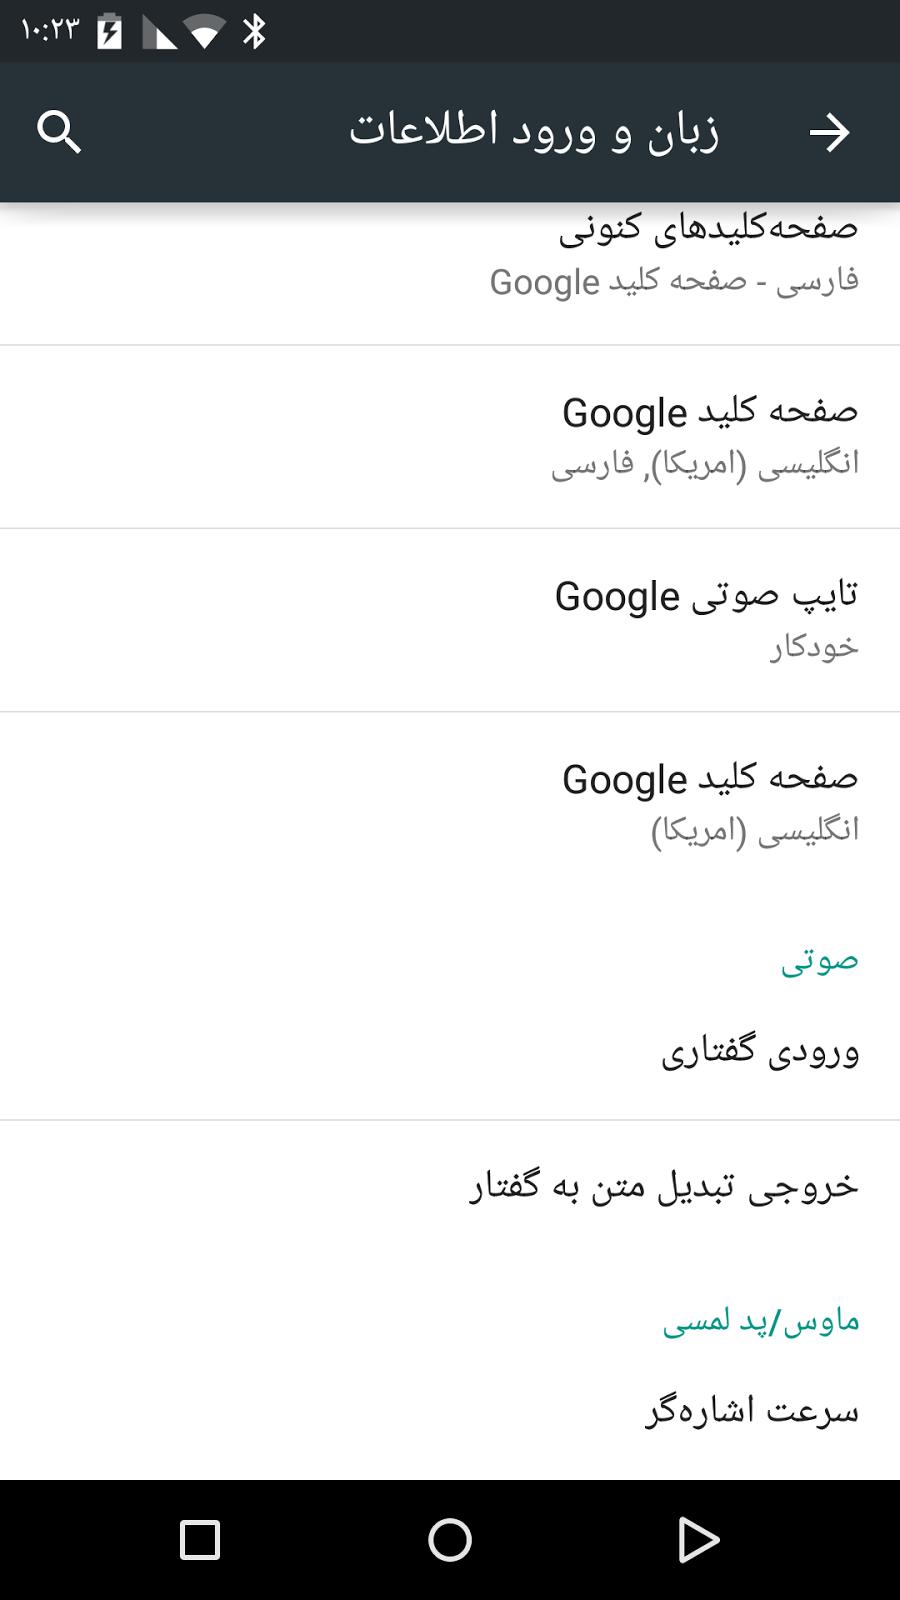 Abieteh - abieteh.com - internetadvices.net